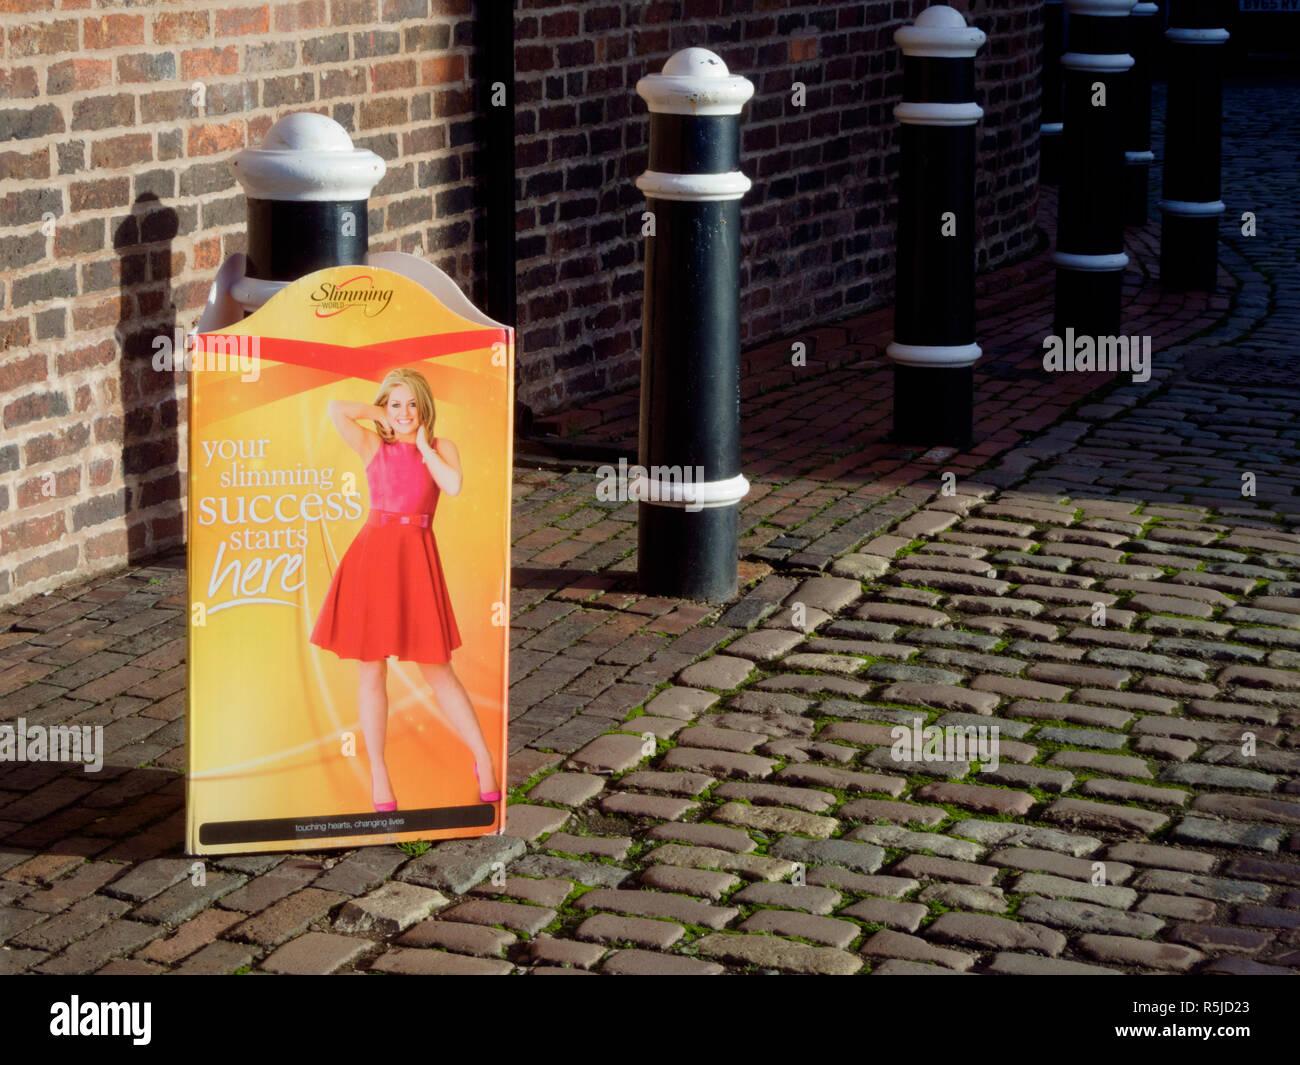 Slimming World Slimming Class Advertising Board, UK - Stock Image